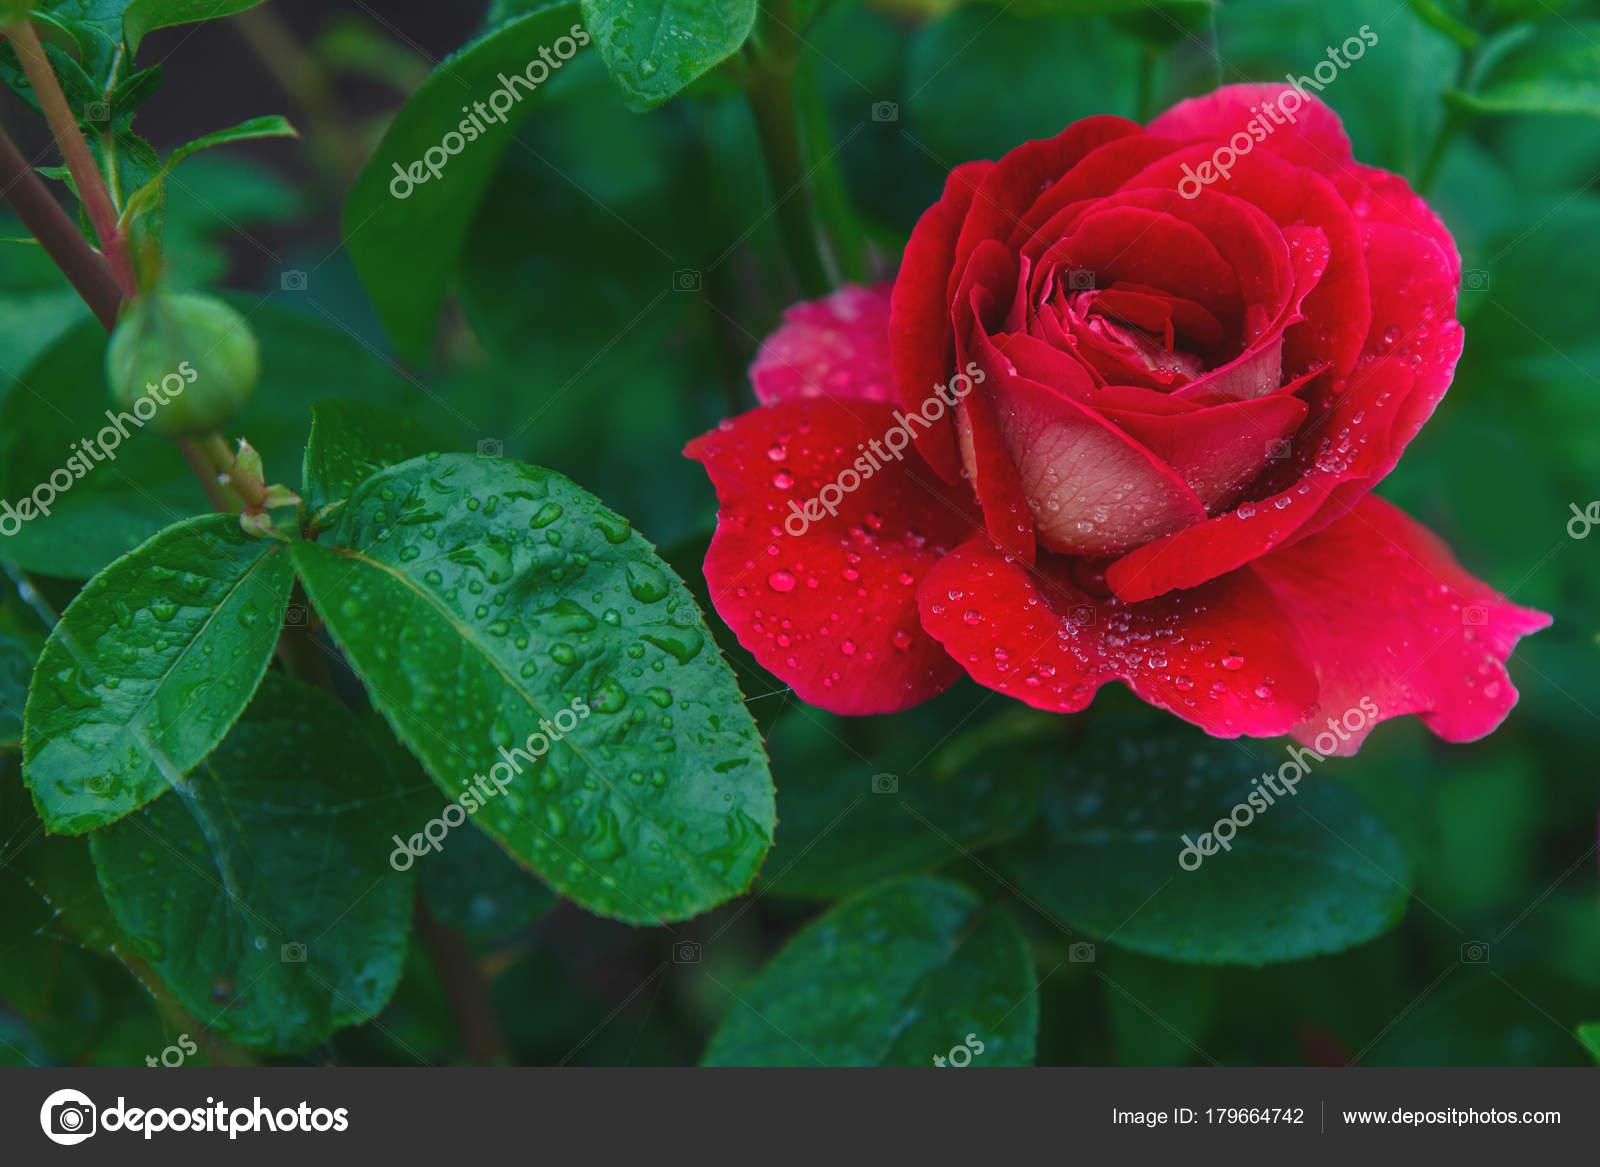 Favorite flowers very beautiful rose beautiful red rose drops dew favorite flowers very beautiful rose beautiful red rose drops dew stock photo izmirmasajfo